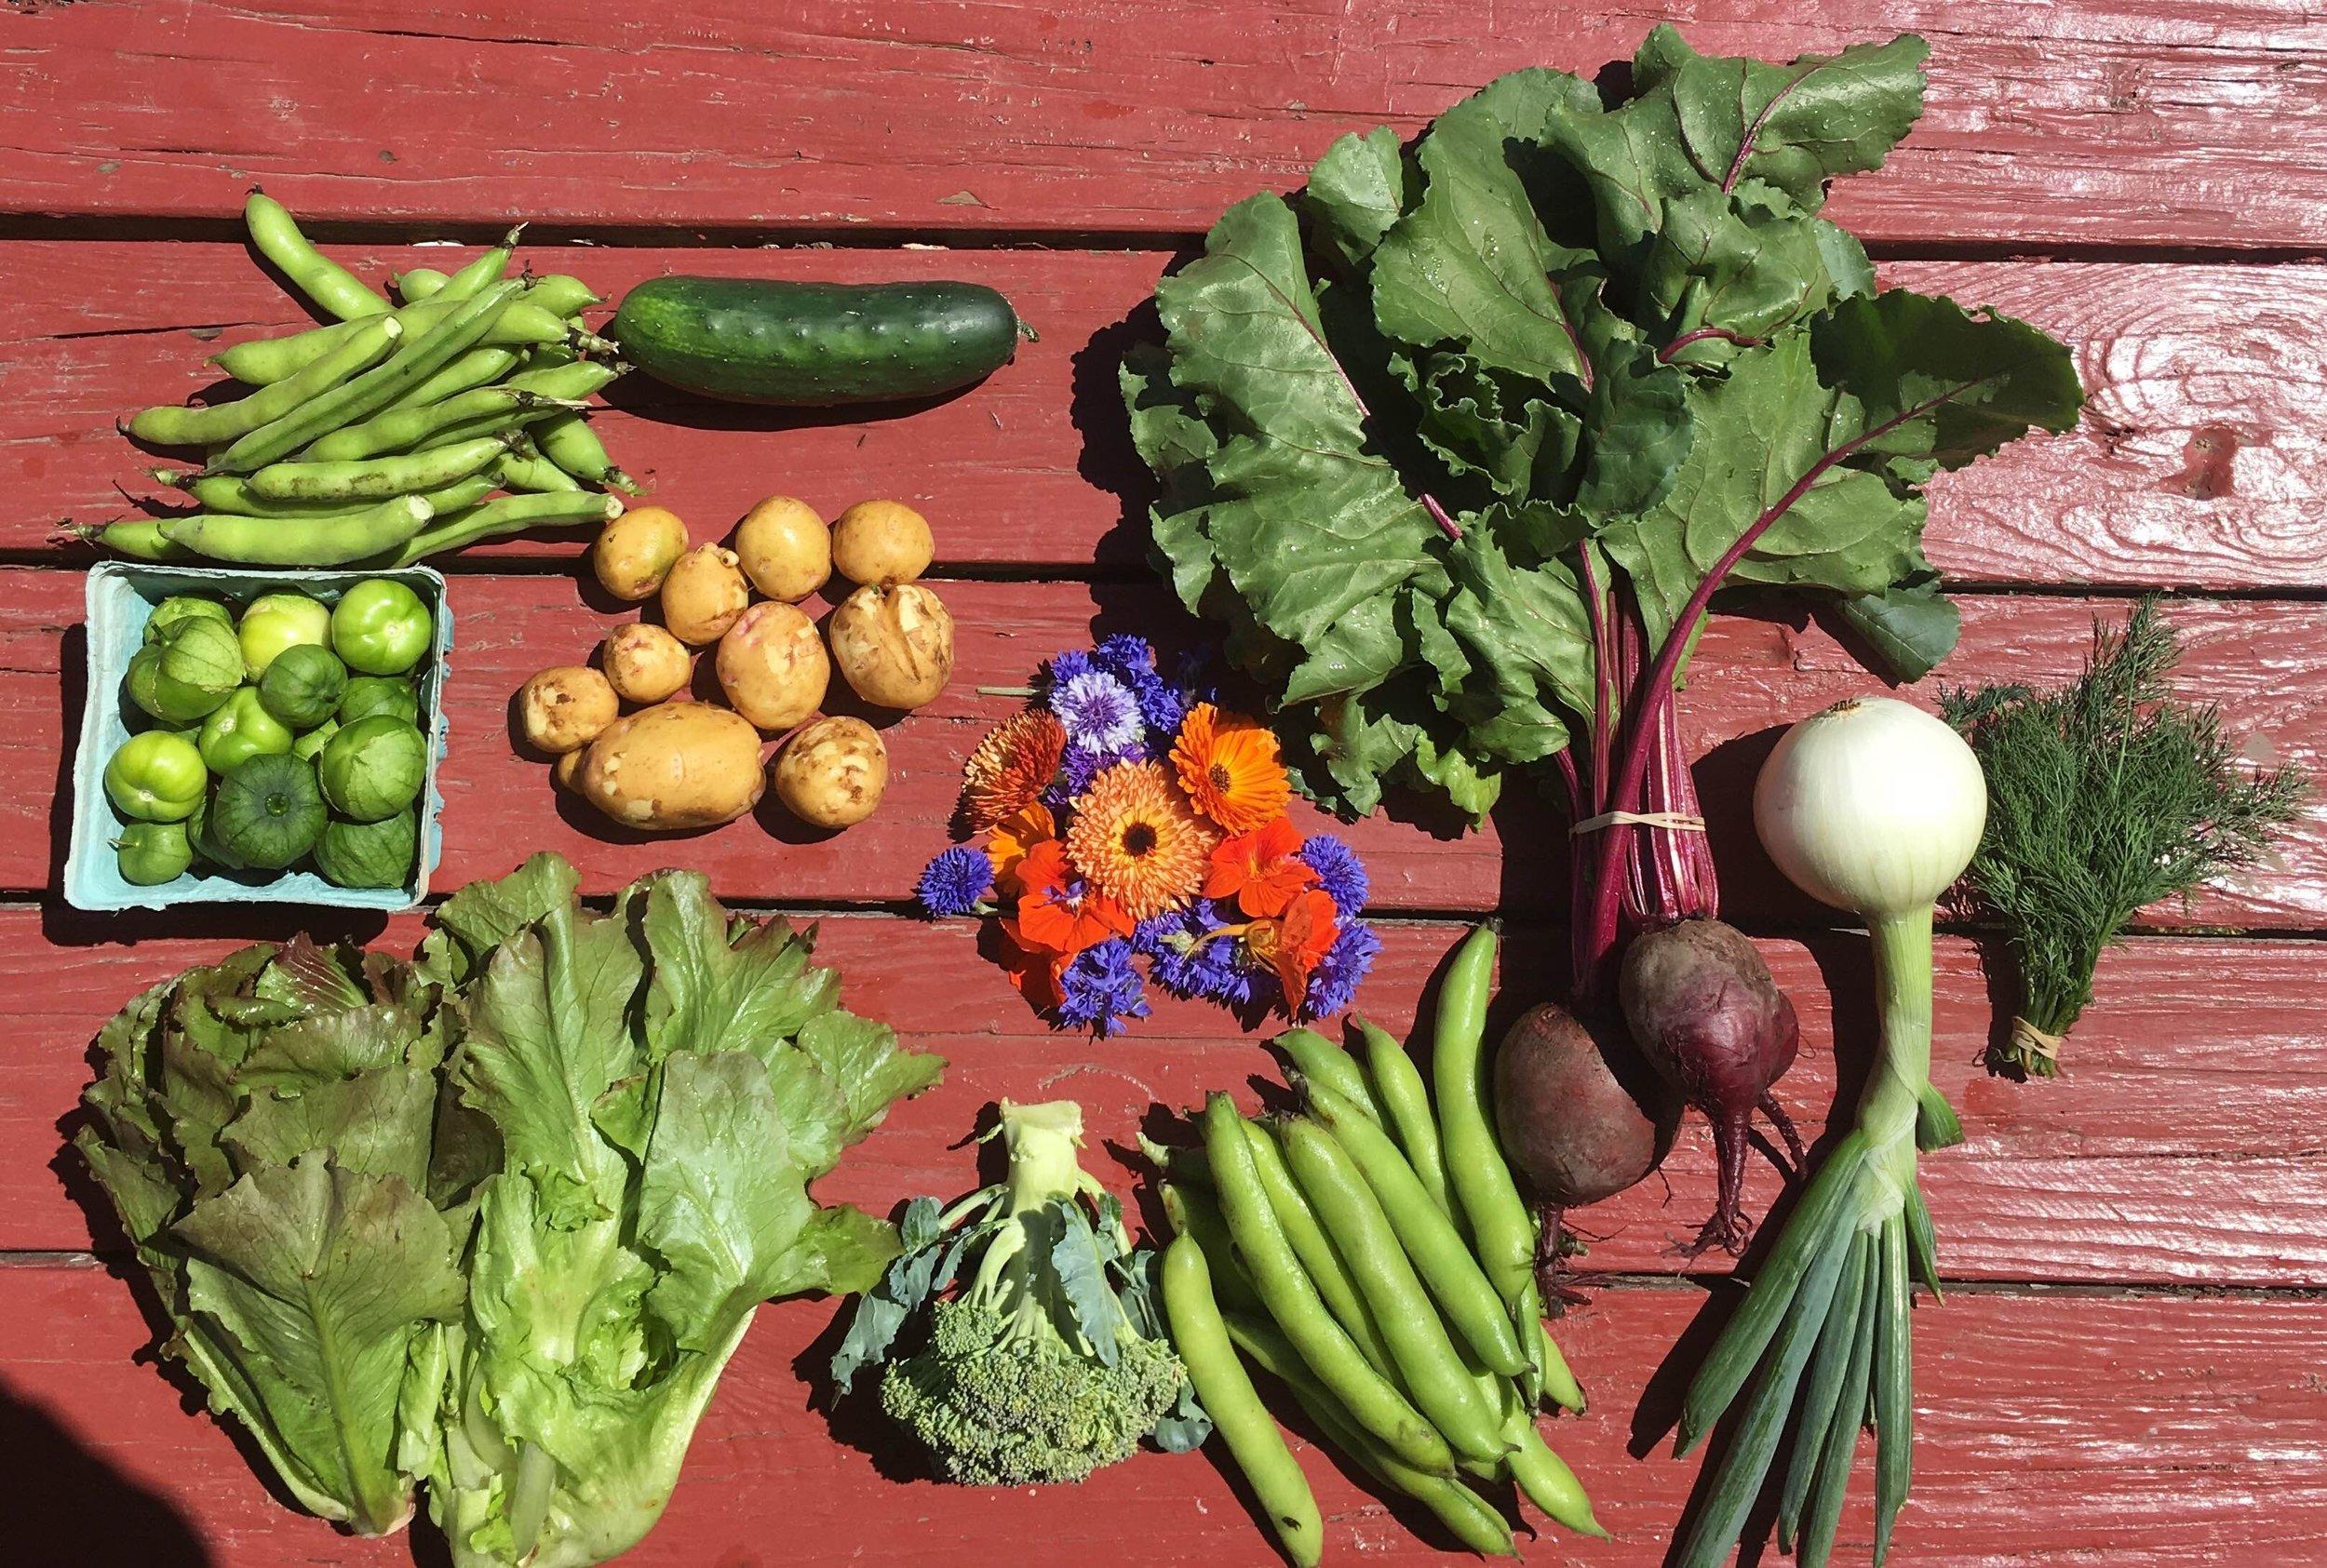 July - Bunching, braising, & salad greensCarrots, BeetsBroccoli, CabbageLettuce- head lettuce & salad mixHerbs- Basil & ParsleyBunched roots- Radish, TurnipOnions- red torpedo onion, sweet Walla WallasArtichokes, Watermelon